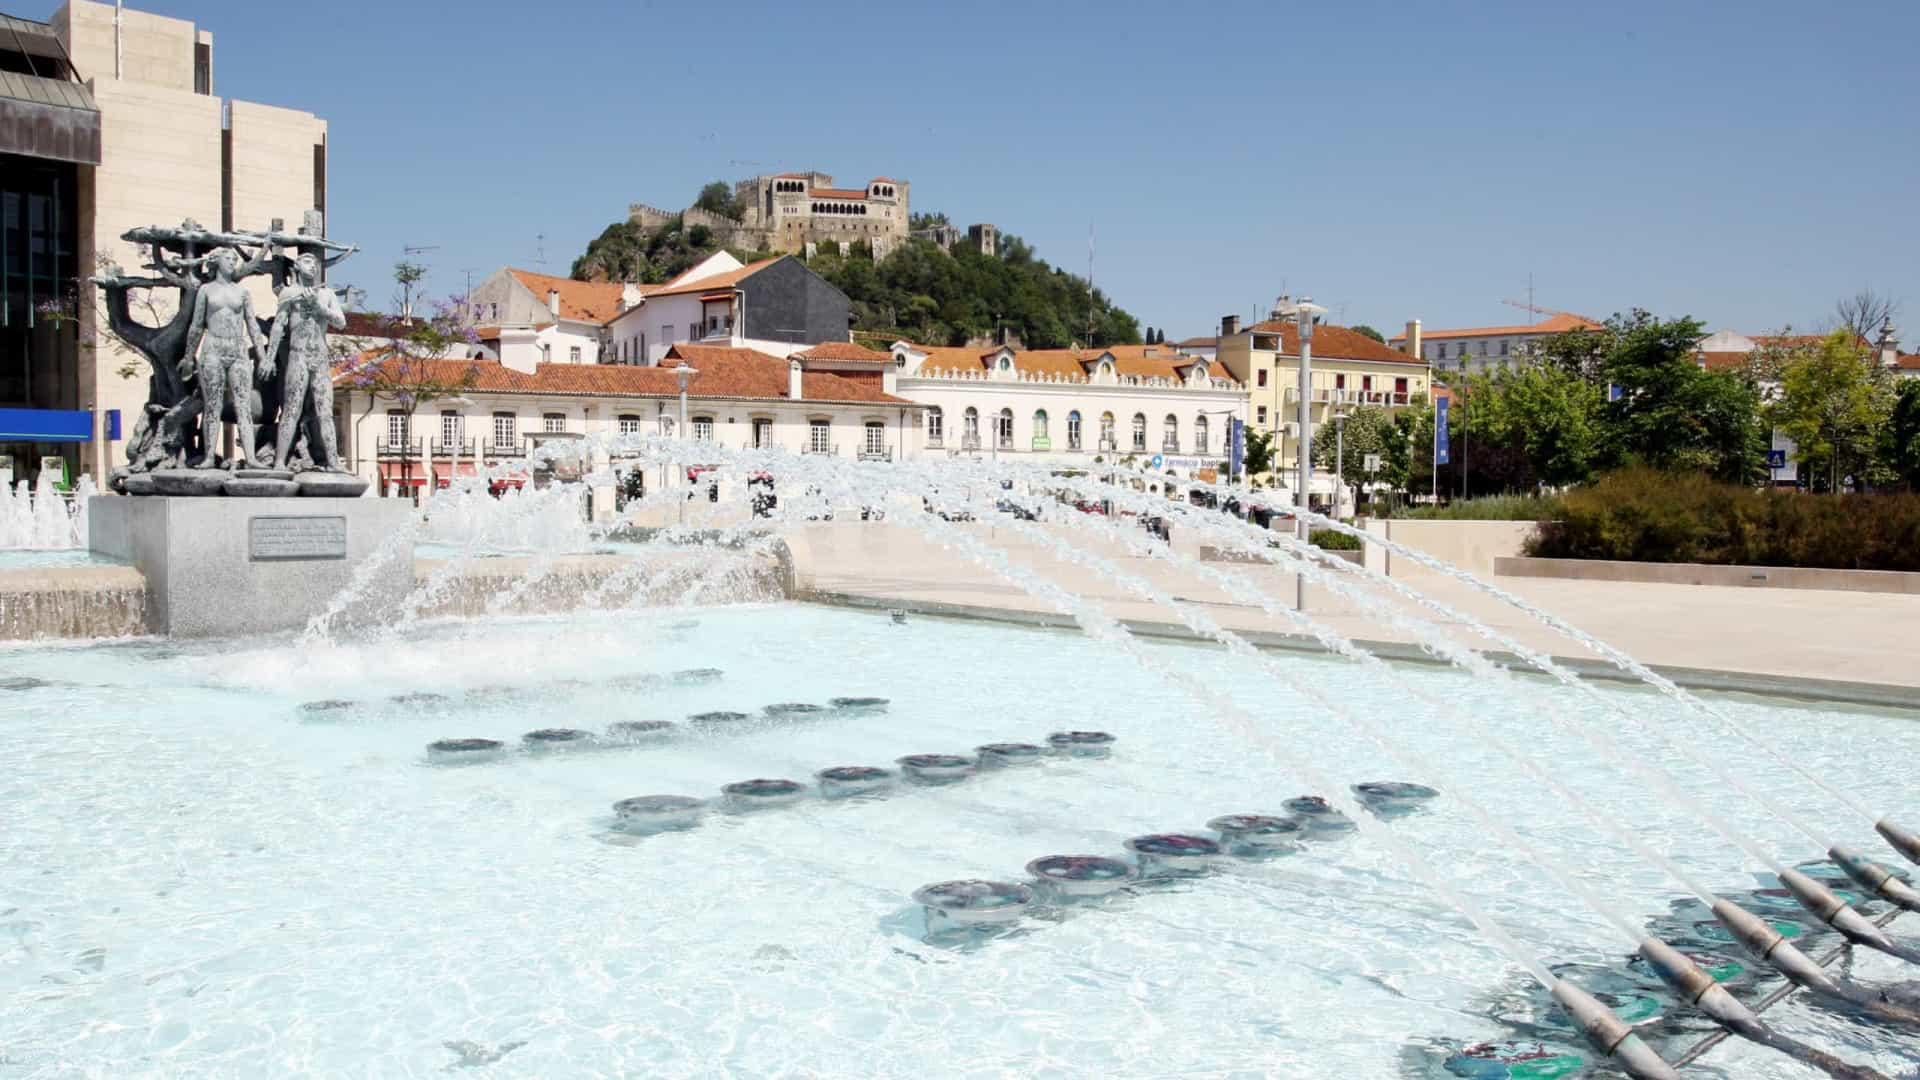 Festival A Porta leva a Leiria 130 atividades durante nove dias